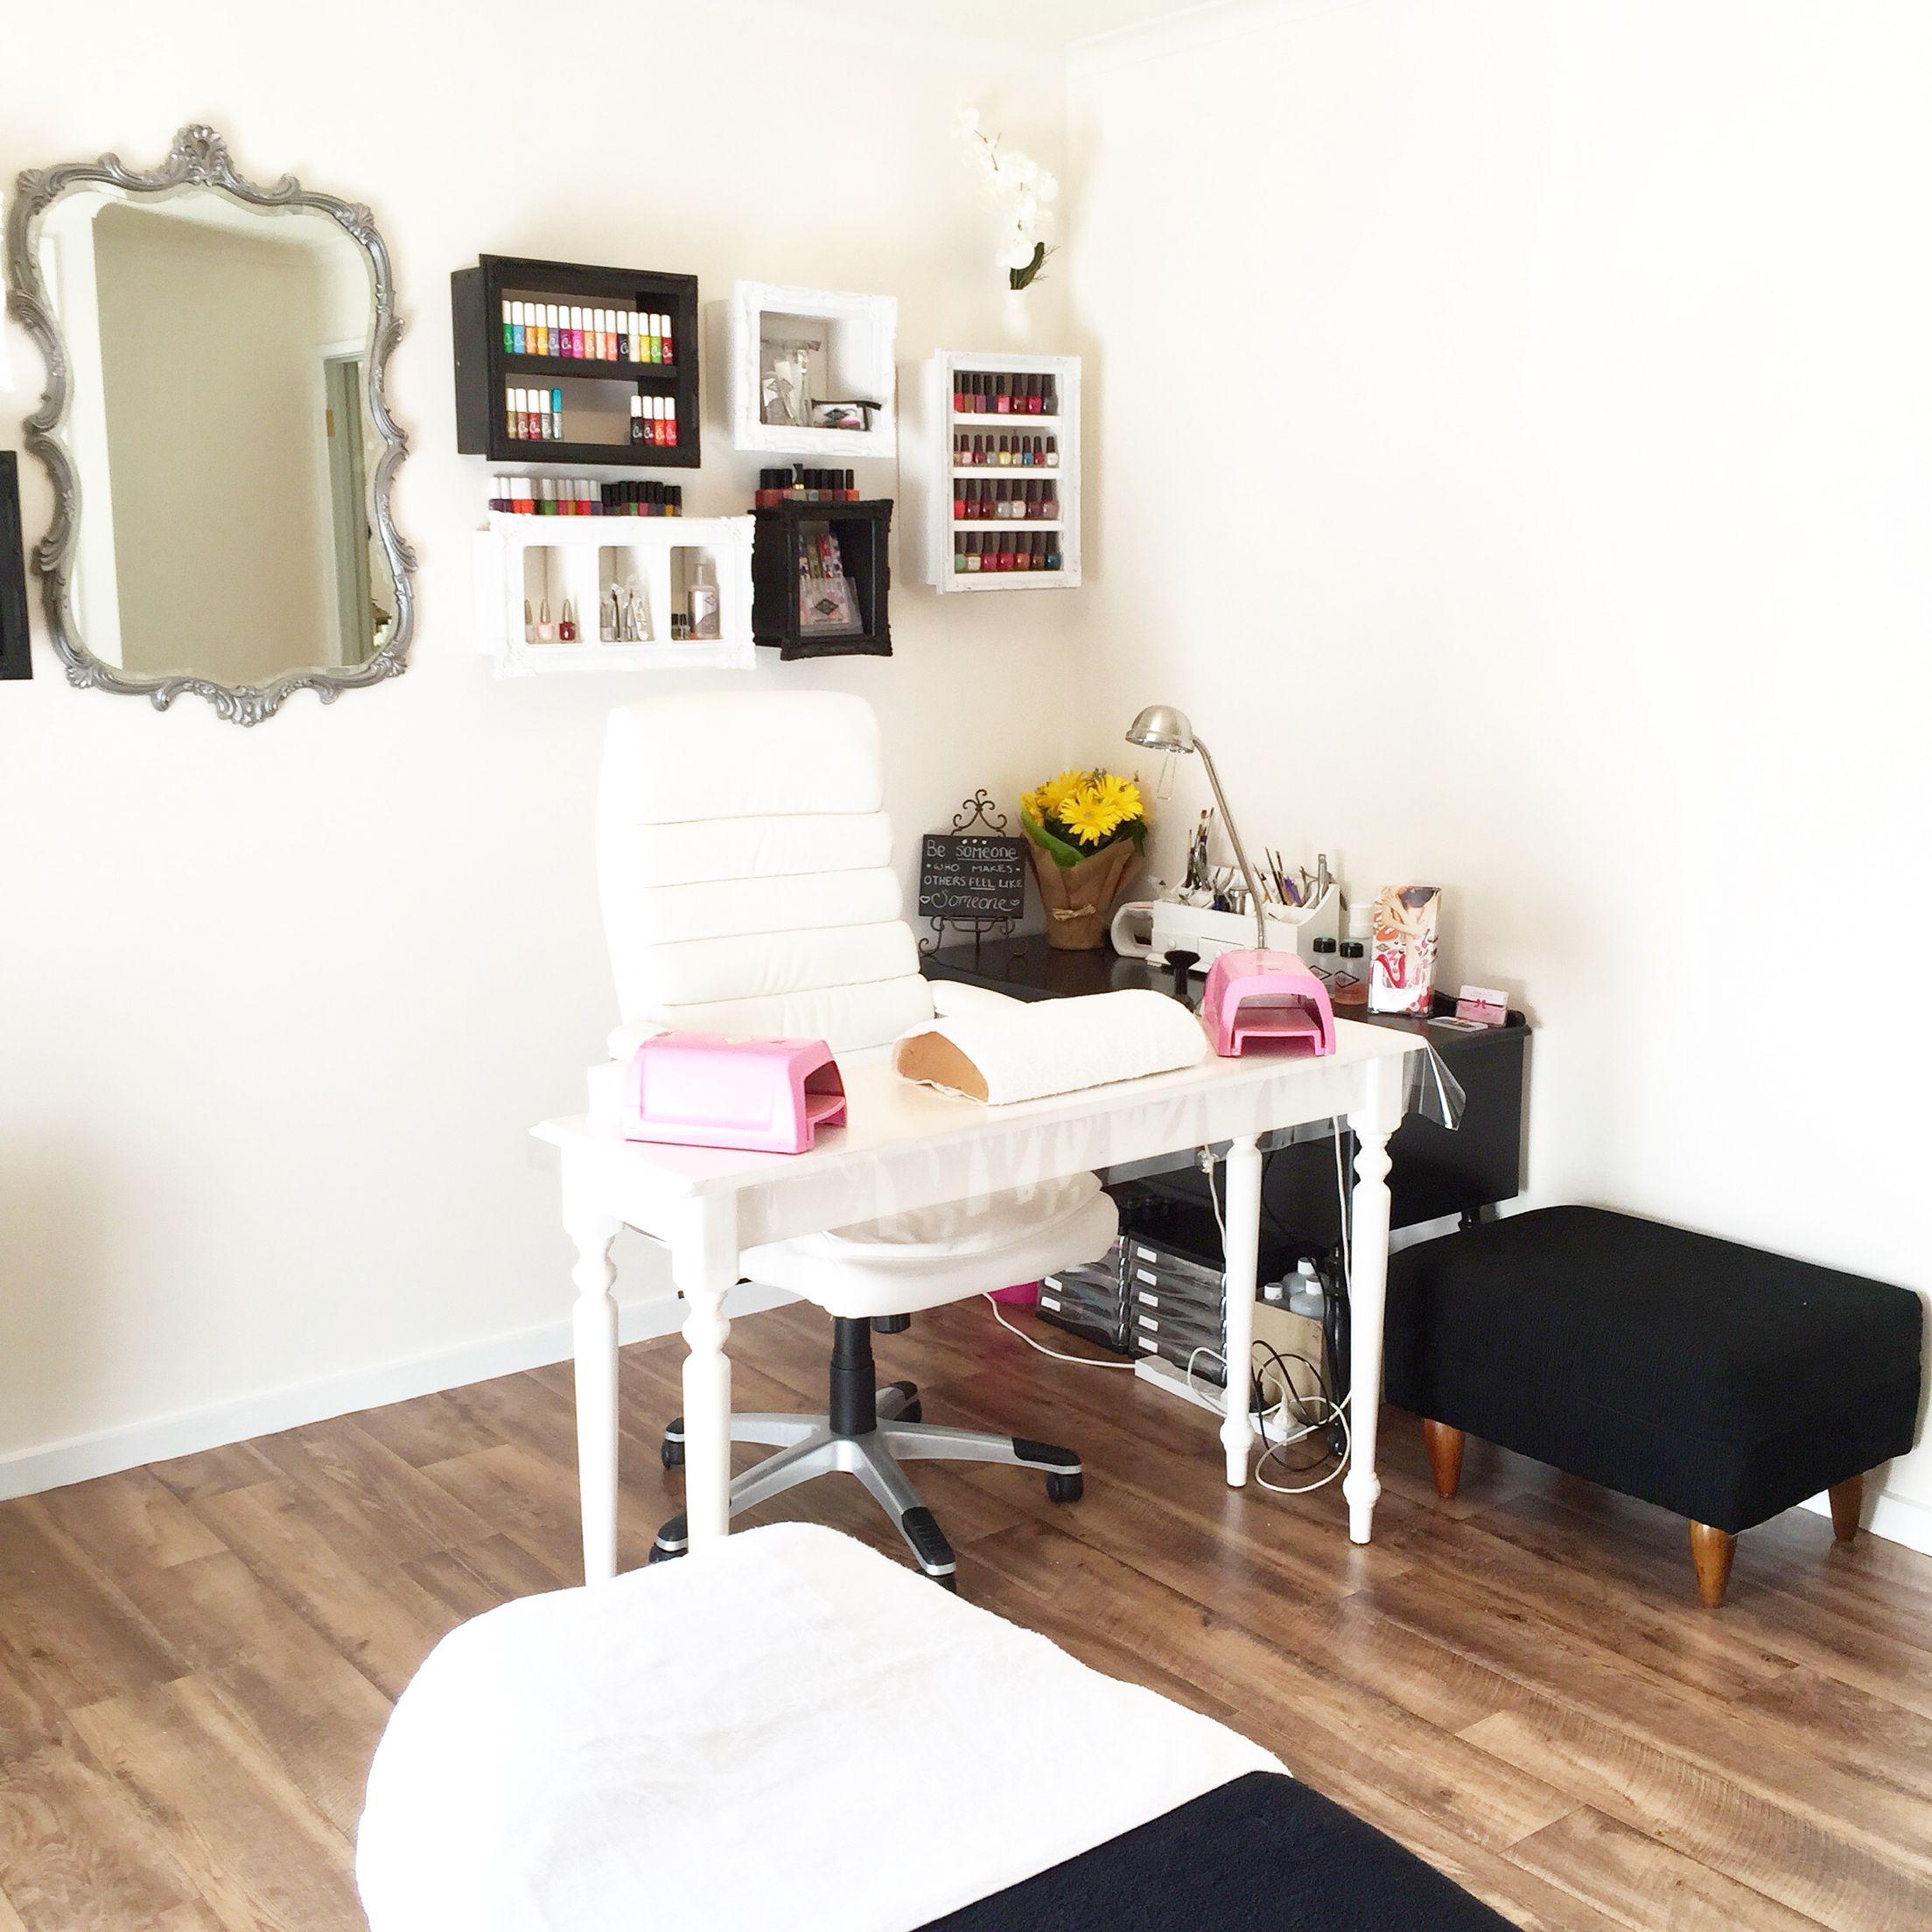 pink salon styling chair executive deals my home nail in bendigo australia www